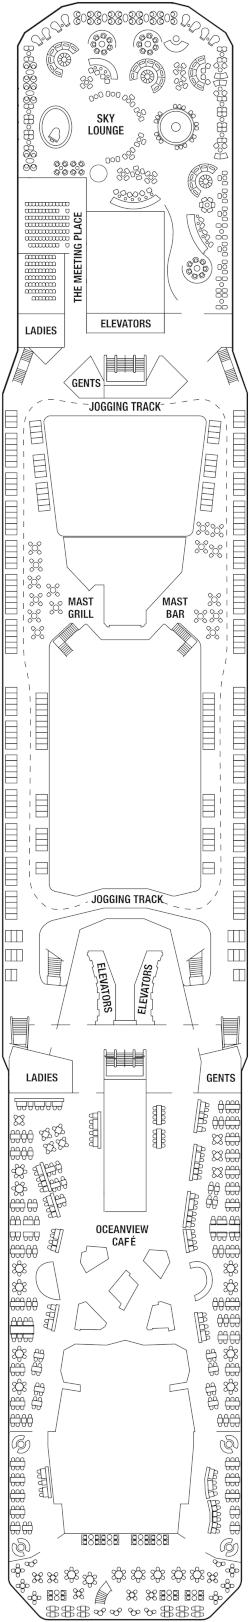 Celebrity Silhouette Deck 14 Deck Plan